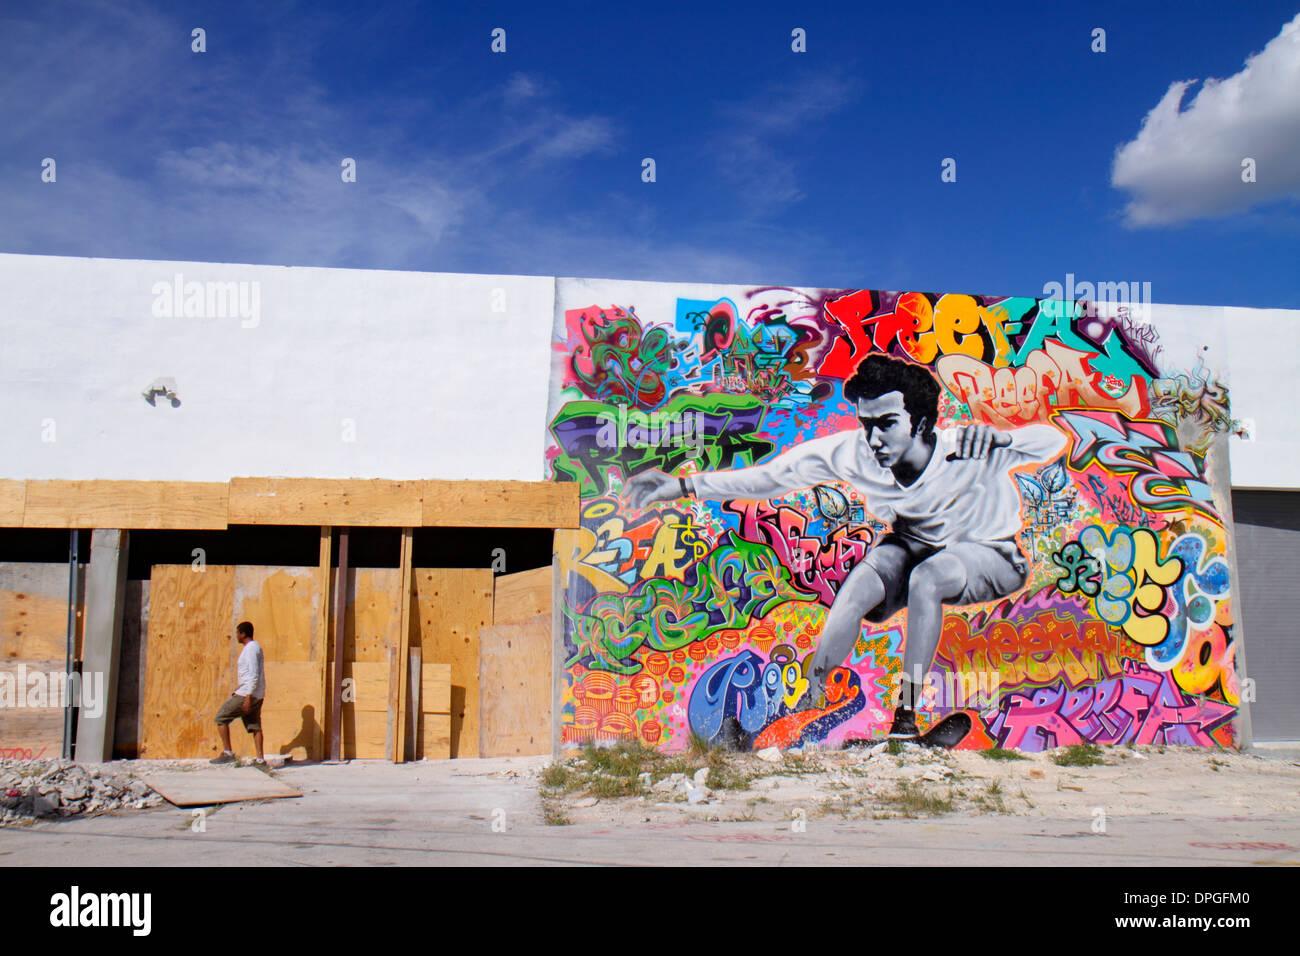 Miami Florida Wynwood Art District mural building - Stock Image